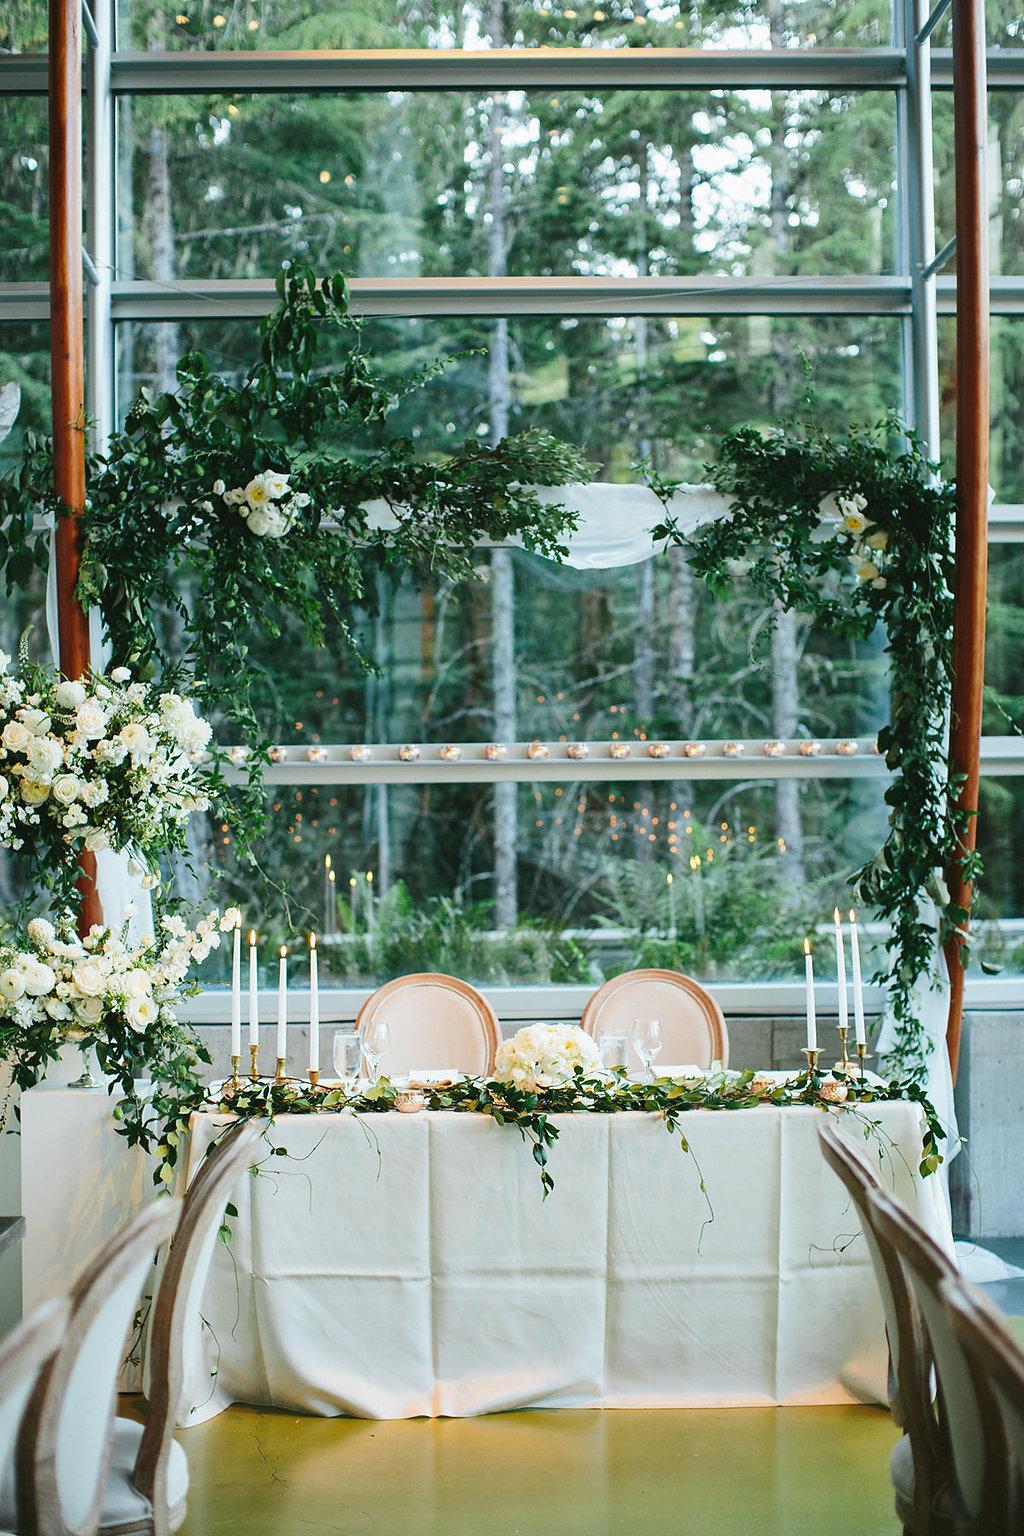 sweetheart tables - photo by Melia Lucida http://ruffledblog.com/elegant-canadian-wedding-with-greenery